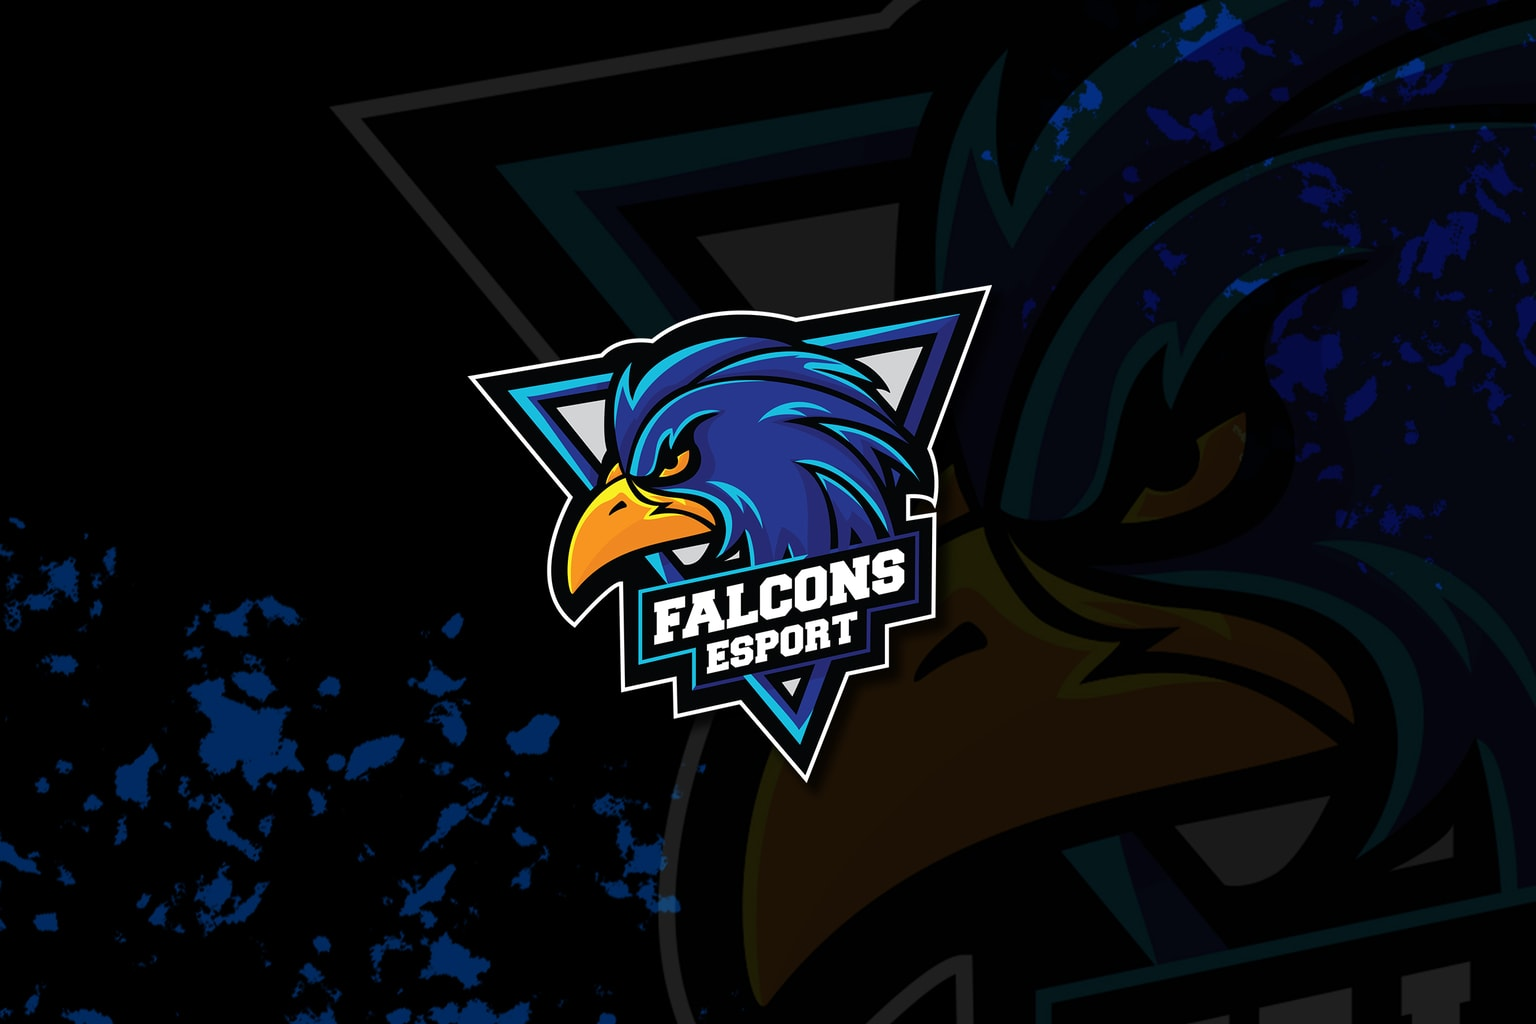 esport logo – mighty falcon 1